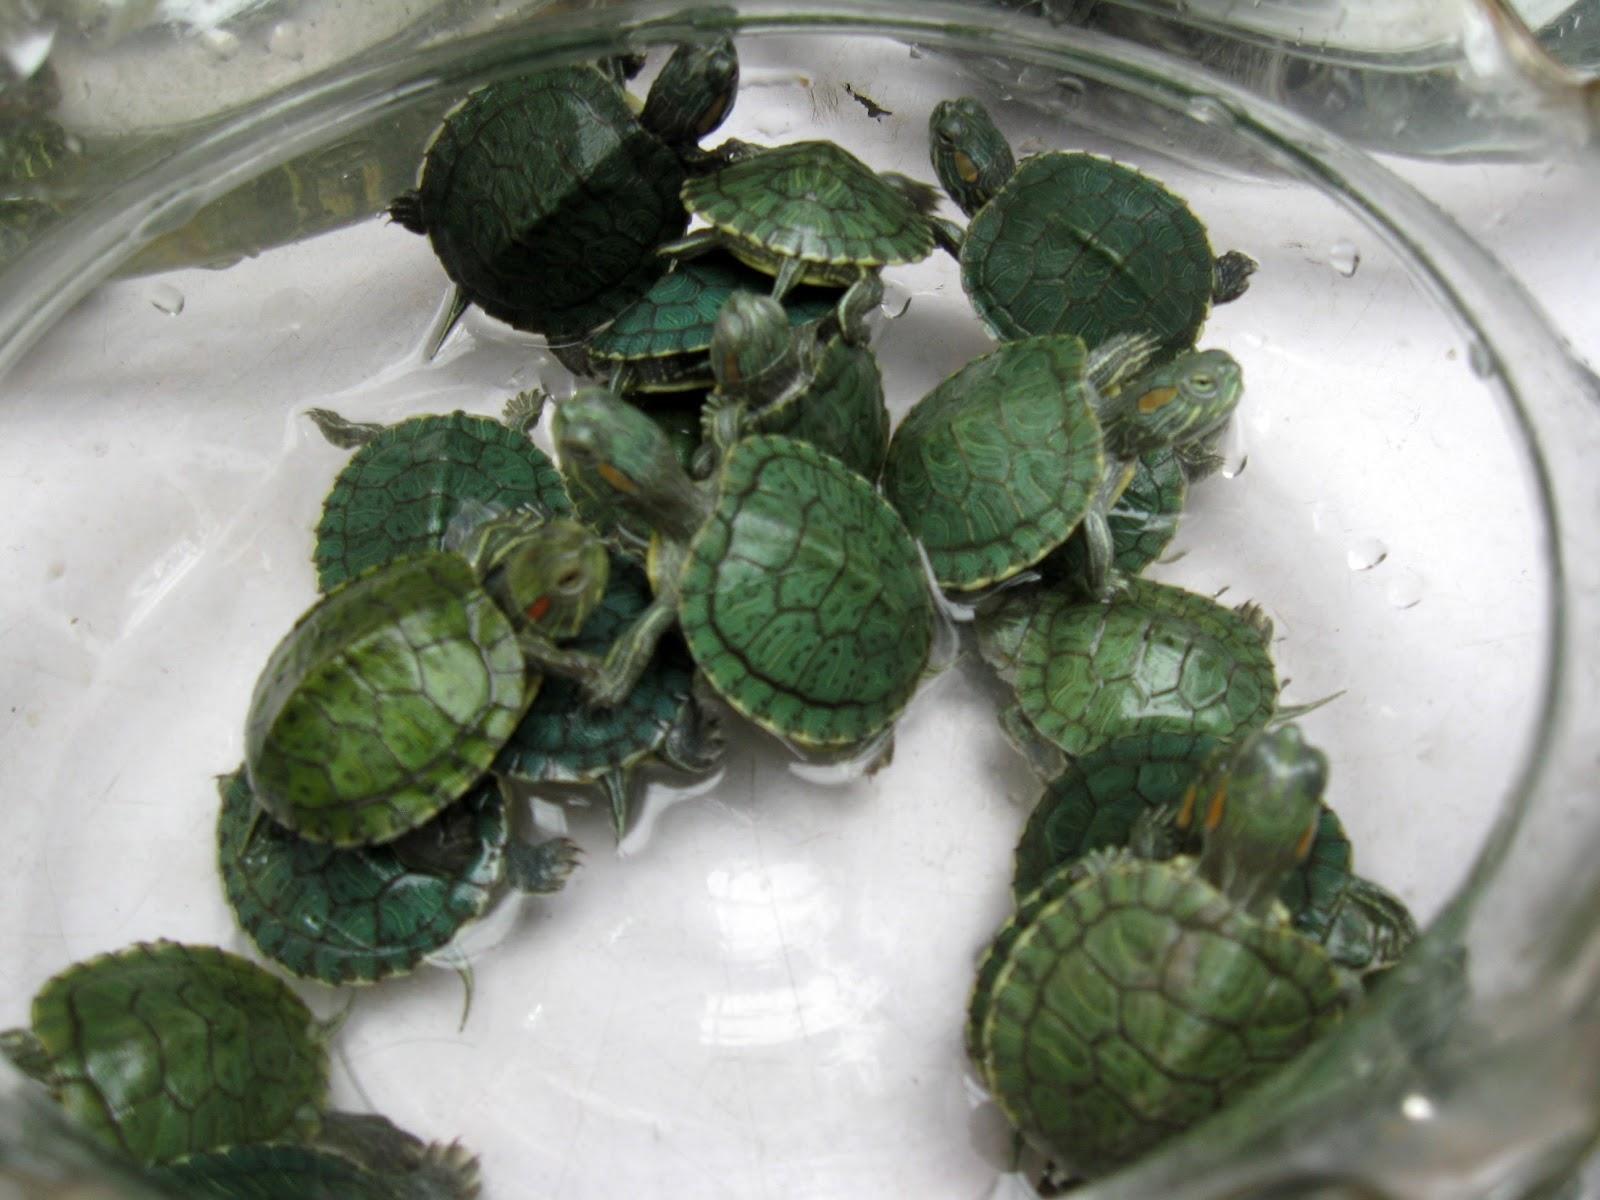 Pet Baby Turtles : Baby Pet Turtles Baby turtles: